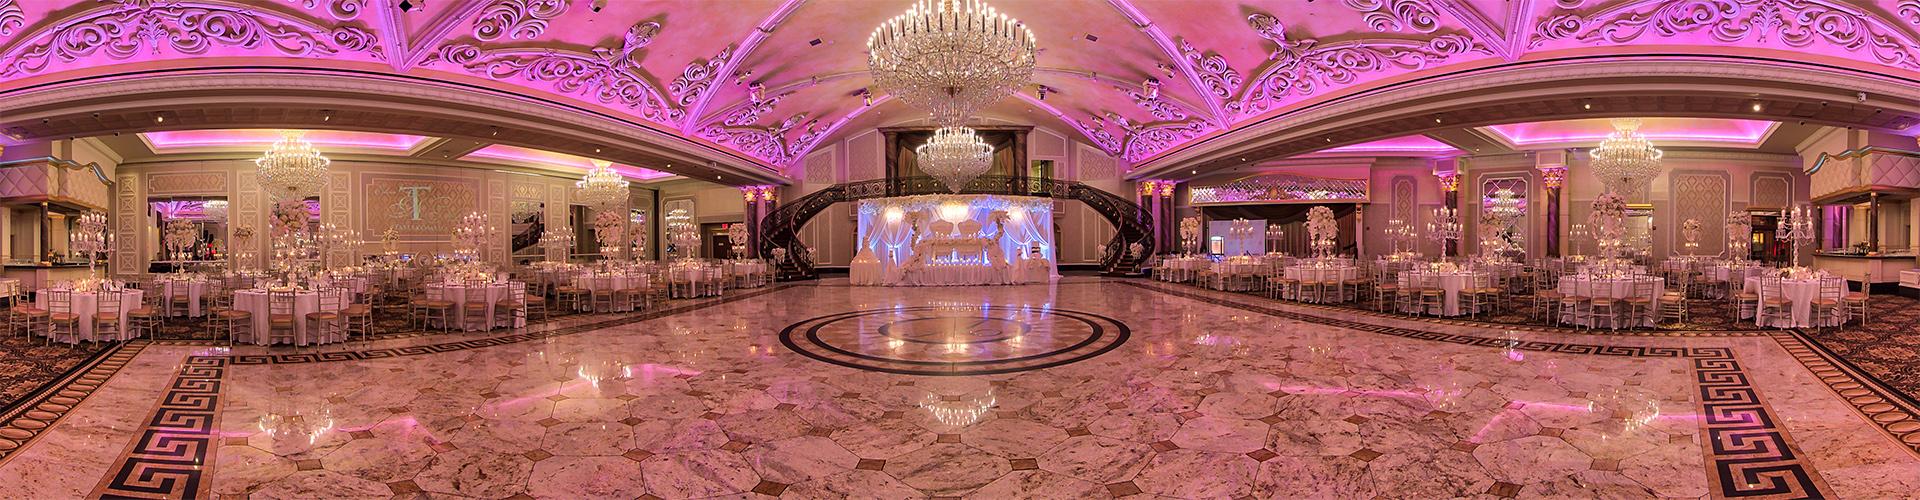 Venetian NJ wedding venue ballroom by 360SiteVisit